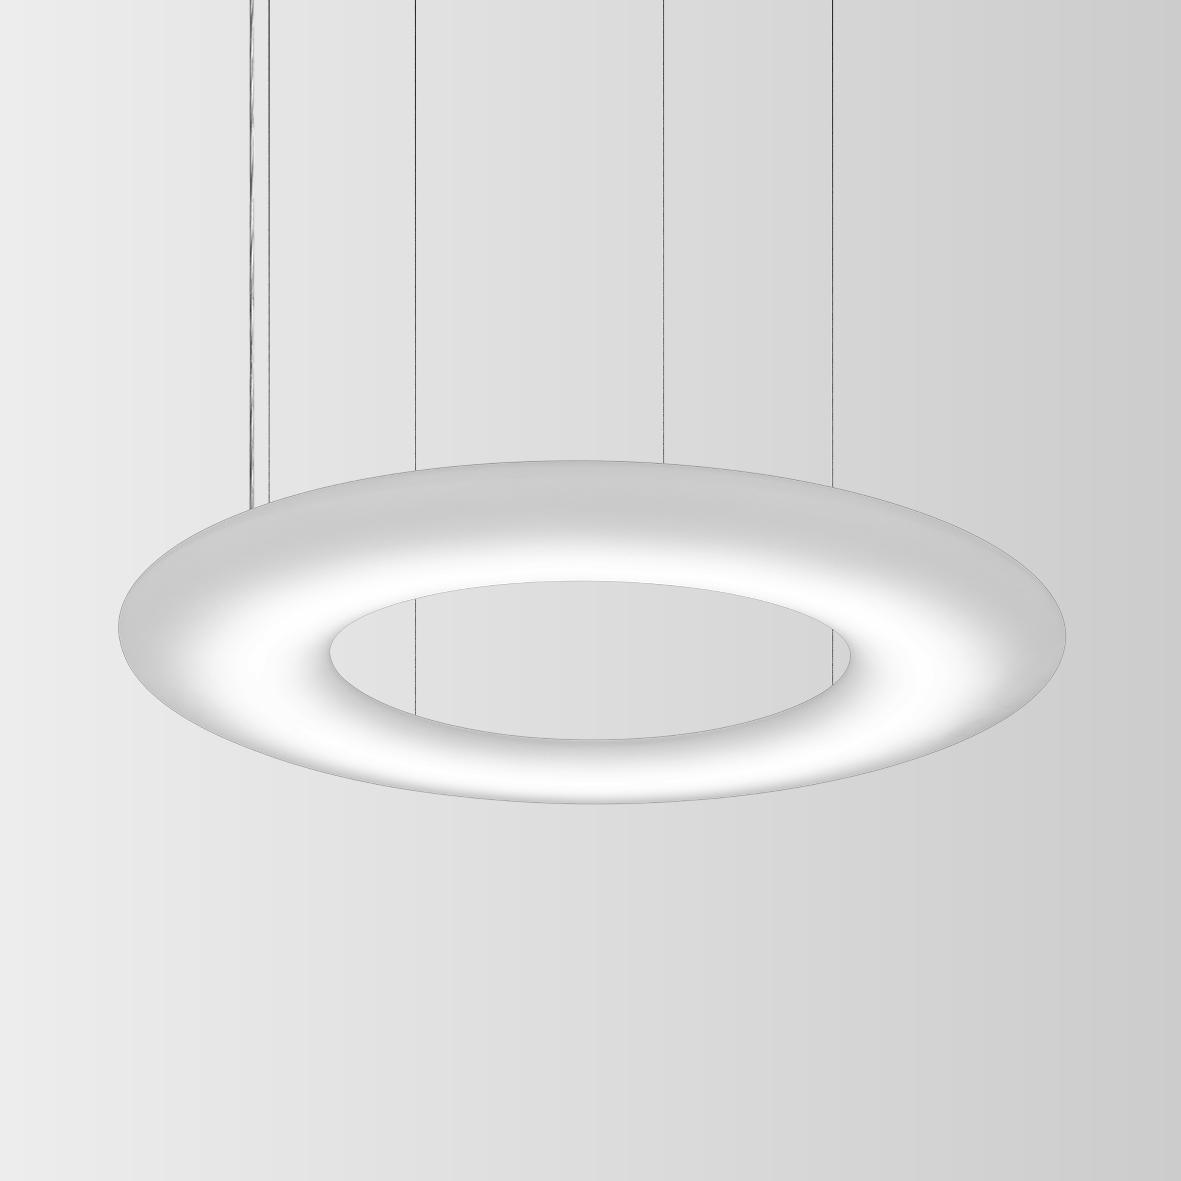 GIGANT 10.0 LED 3000K DIM VALGE 42W 85 220-240VAC, rippvalgusti